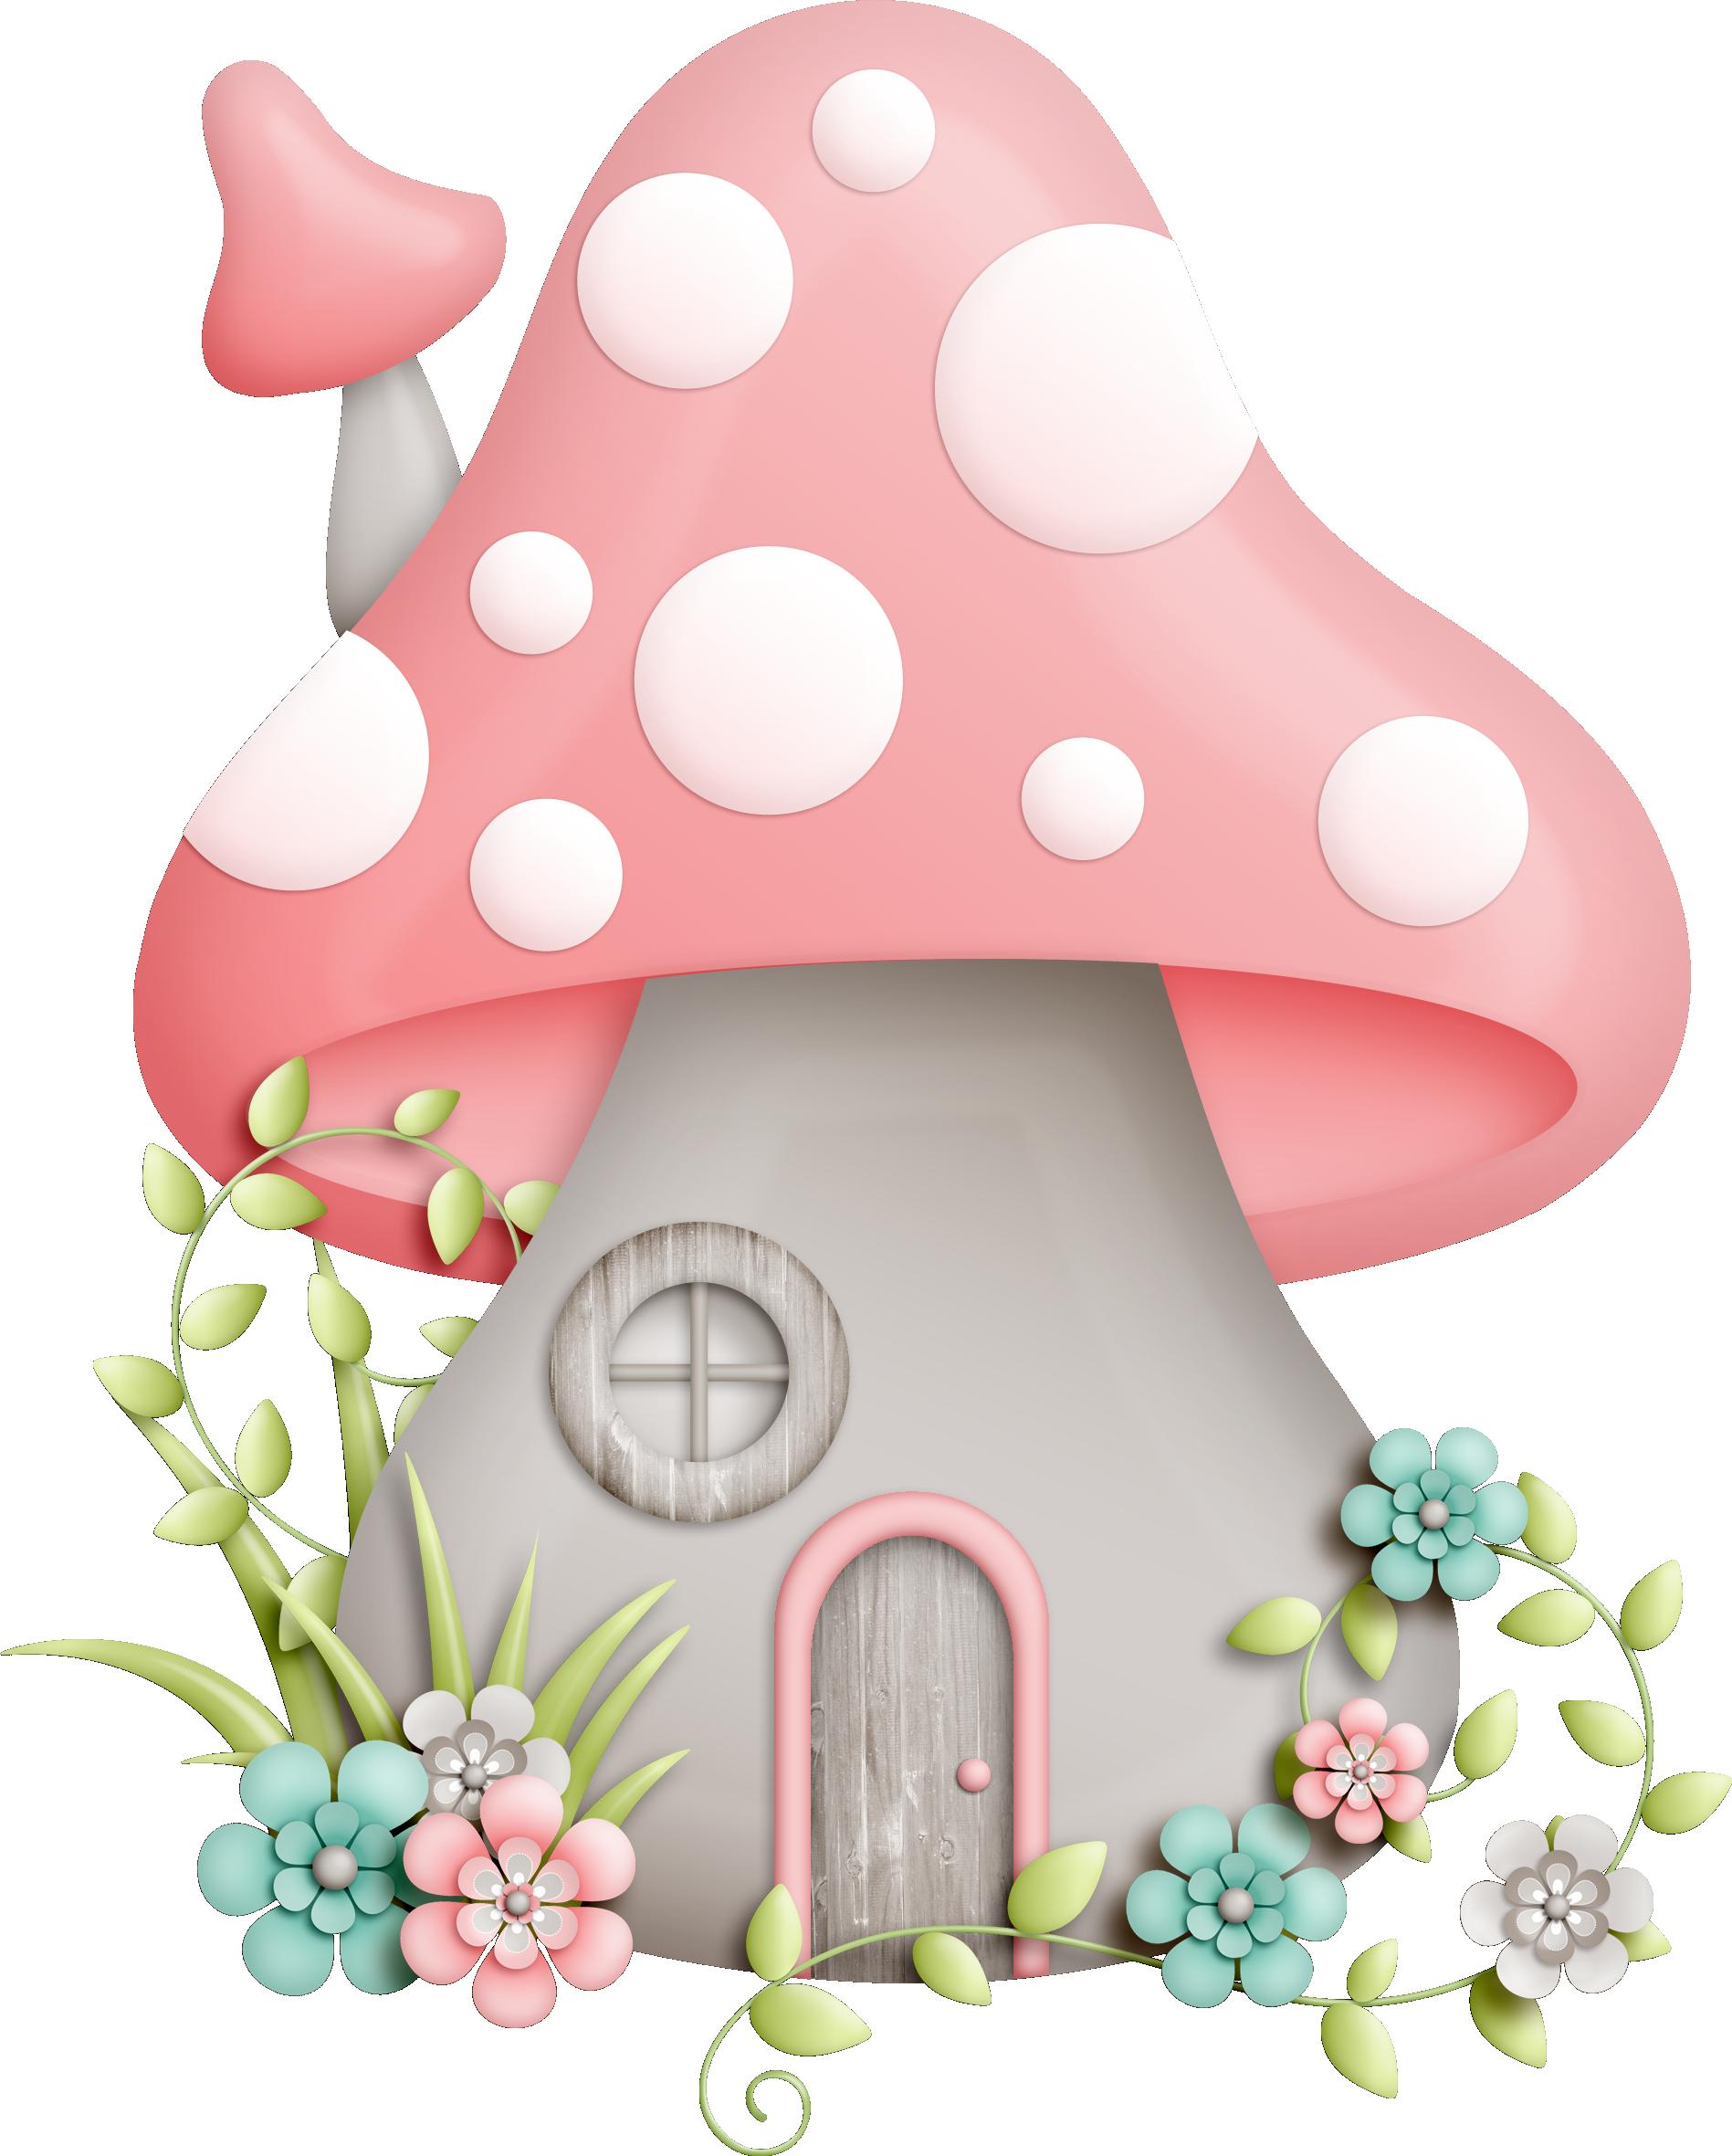 homgos   hongos   Pinterest   Clip art, Decoupage and Mushrooms